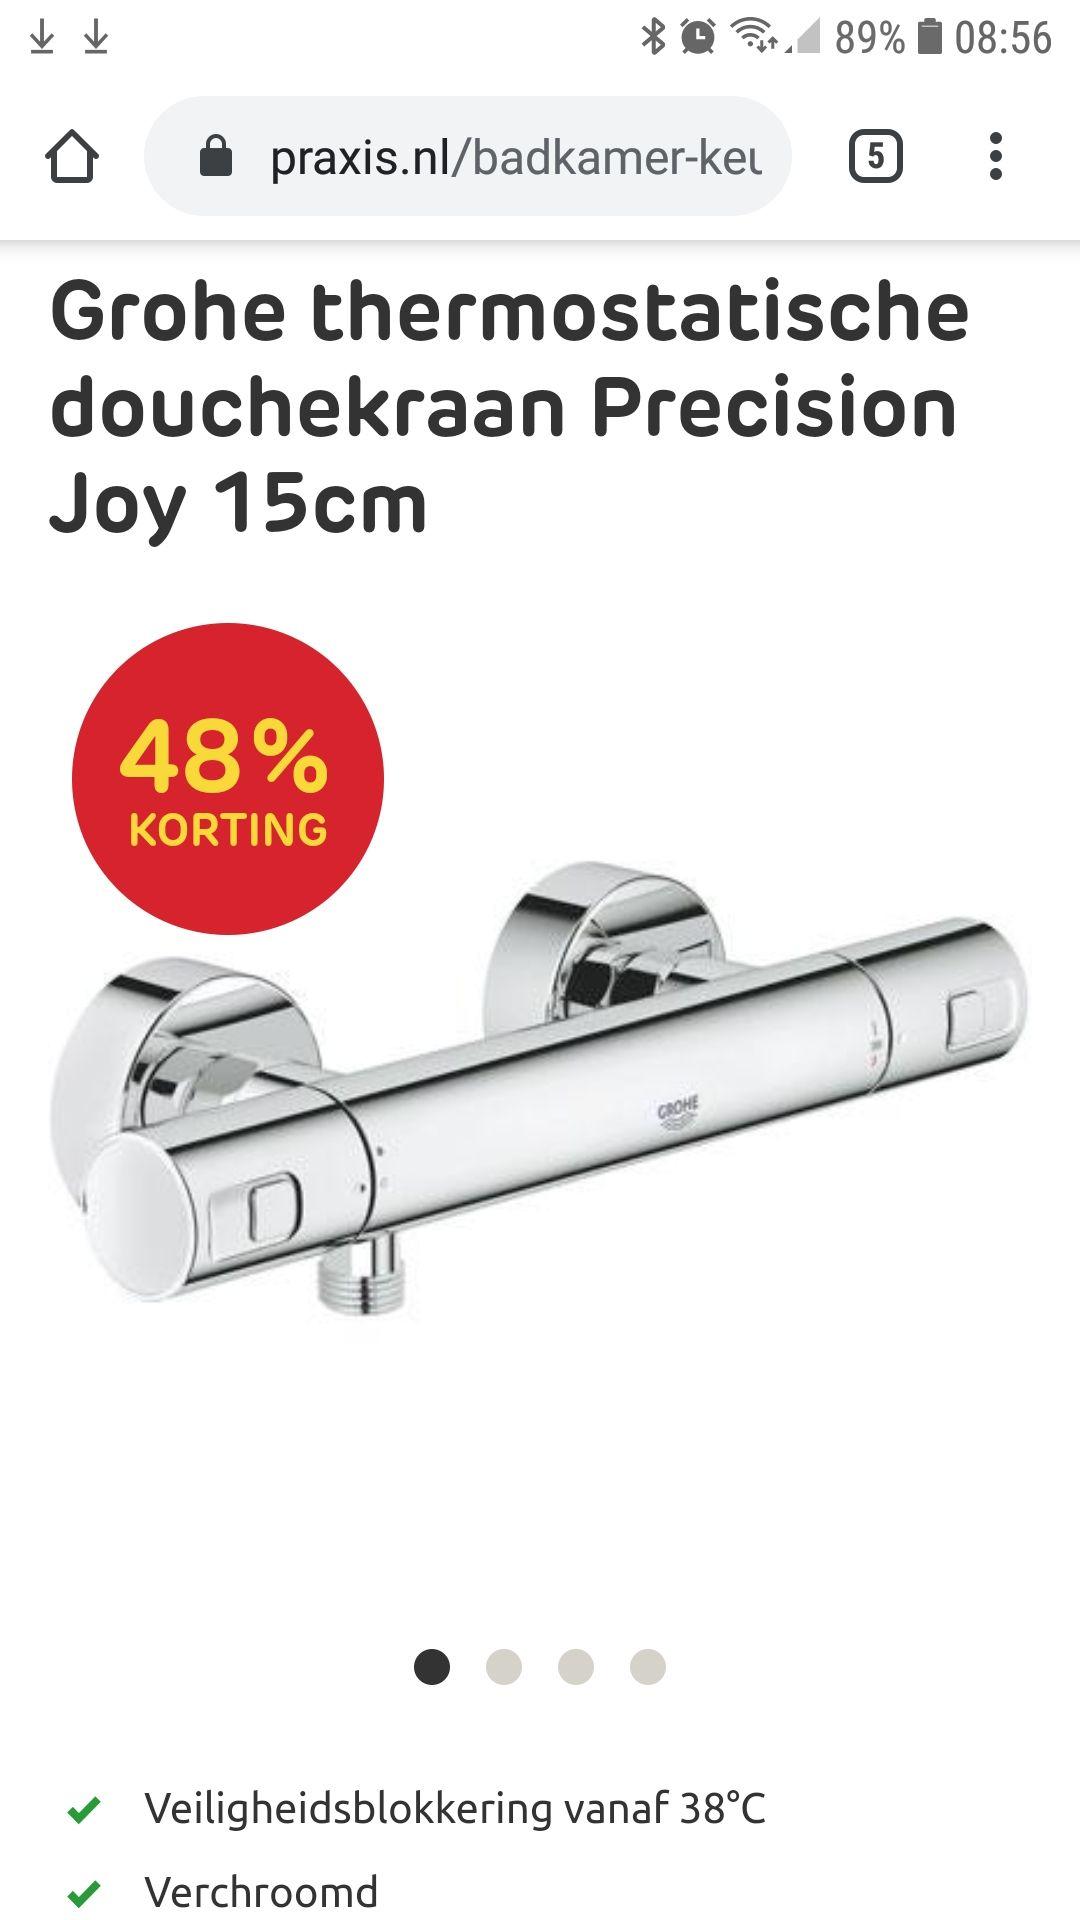 Grohe thermostatische douchekraan Precision Joy 15cm